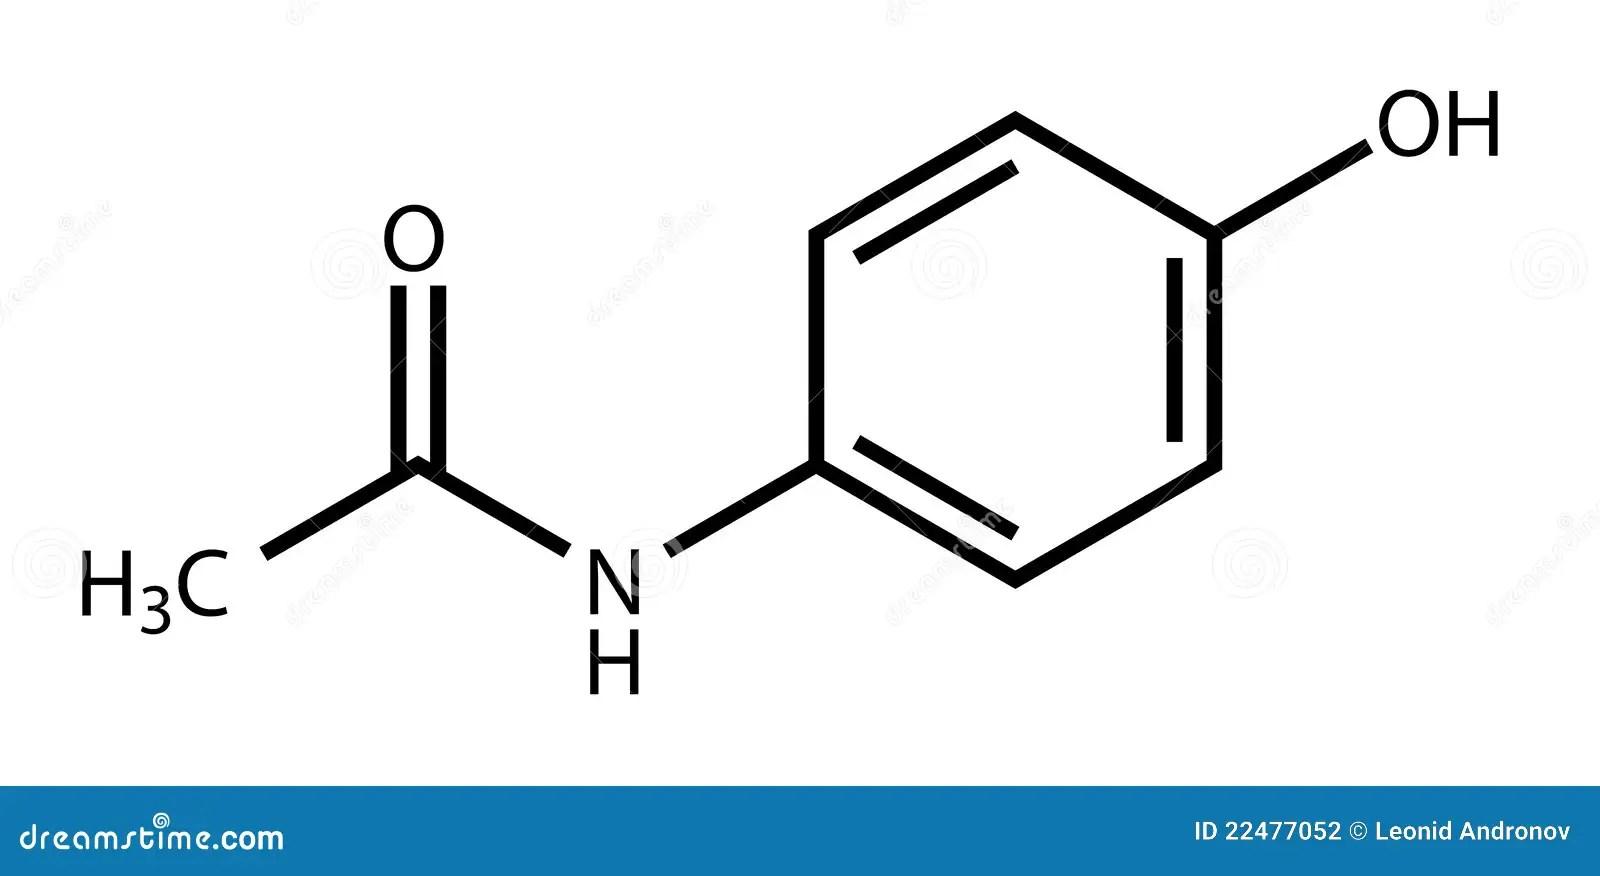 Structural Formula Of Paracetamol (acetaminophen) Stock